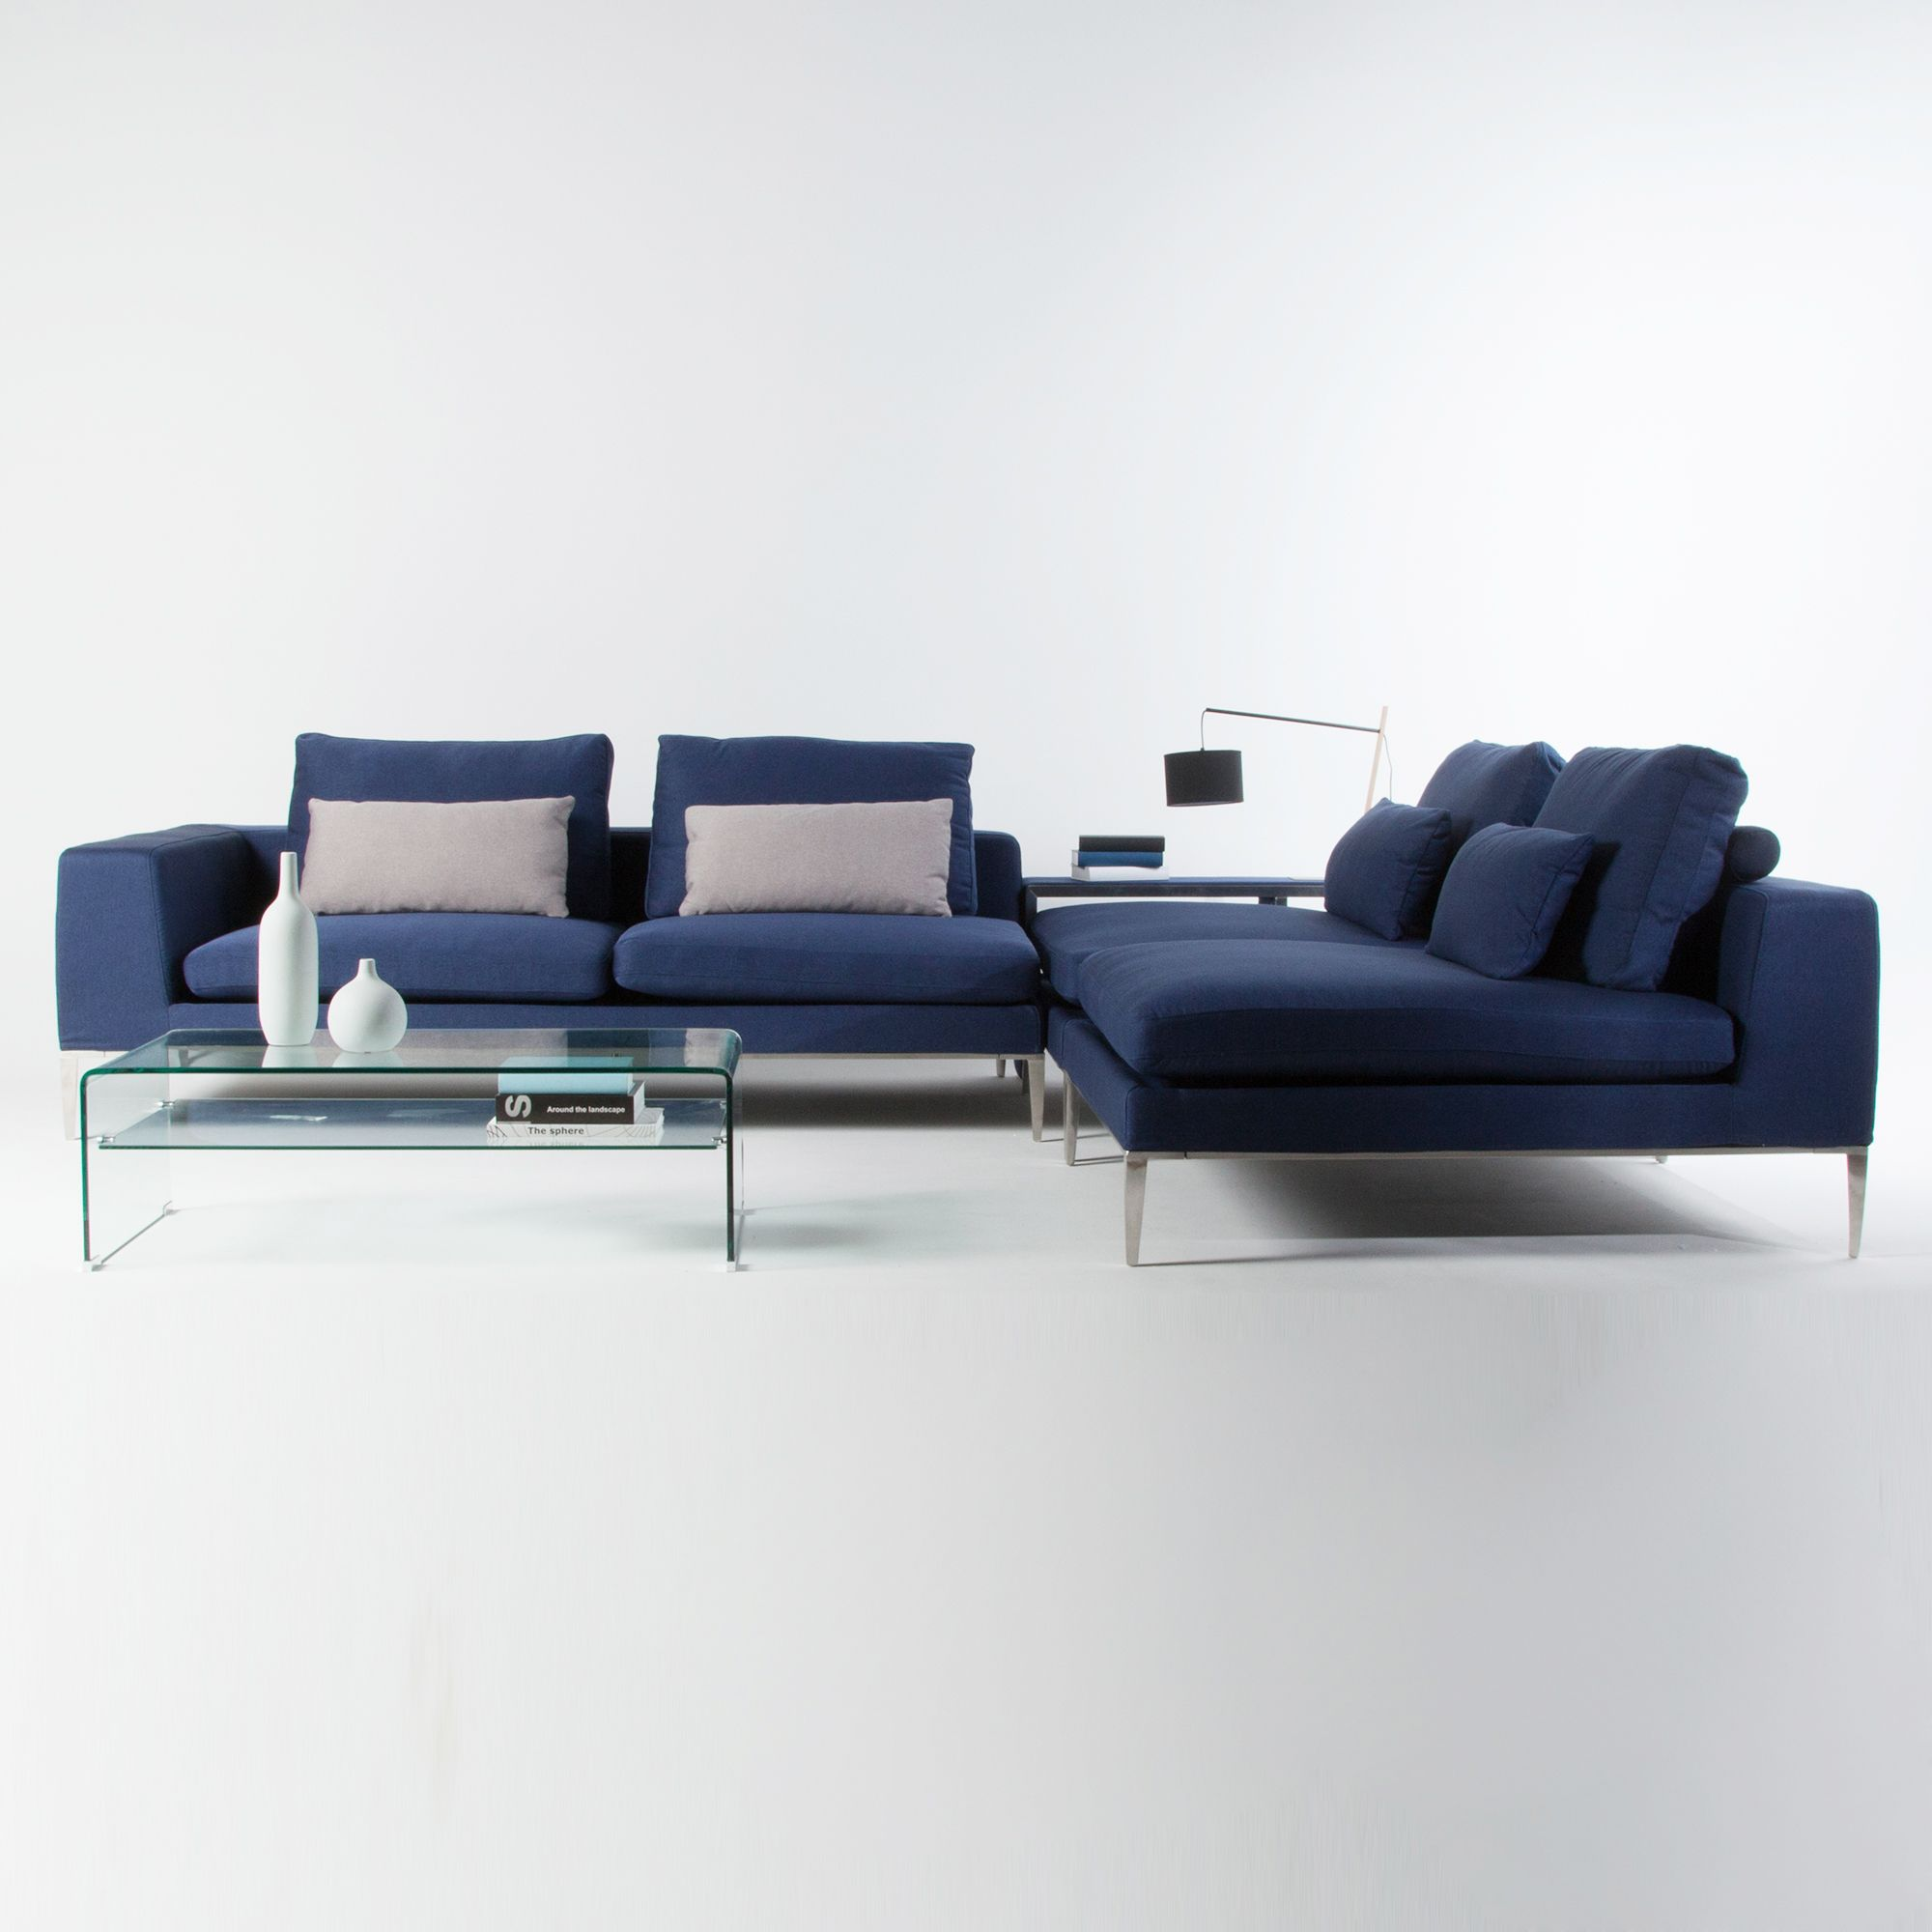 Canapé d angle modulable tissu bleu 4 places avec pieds métal